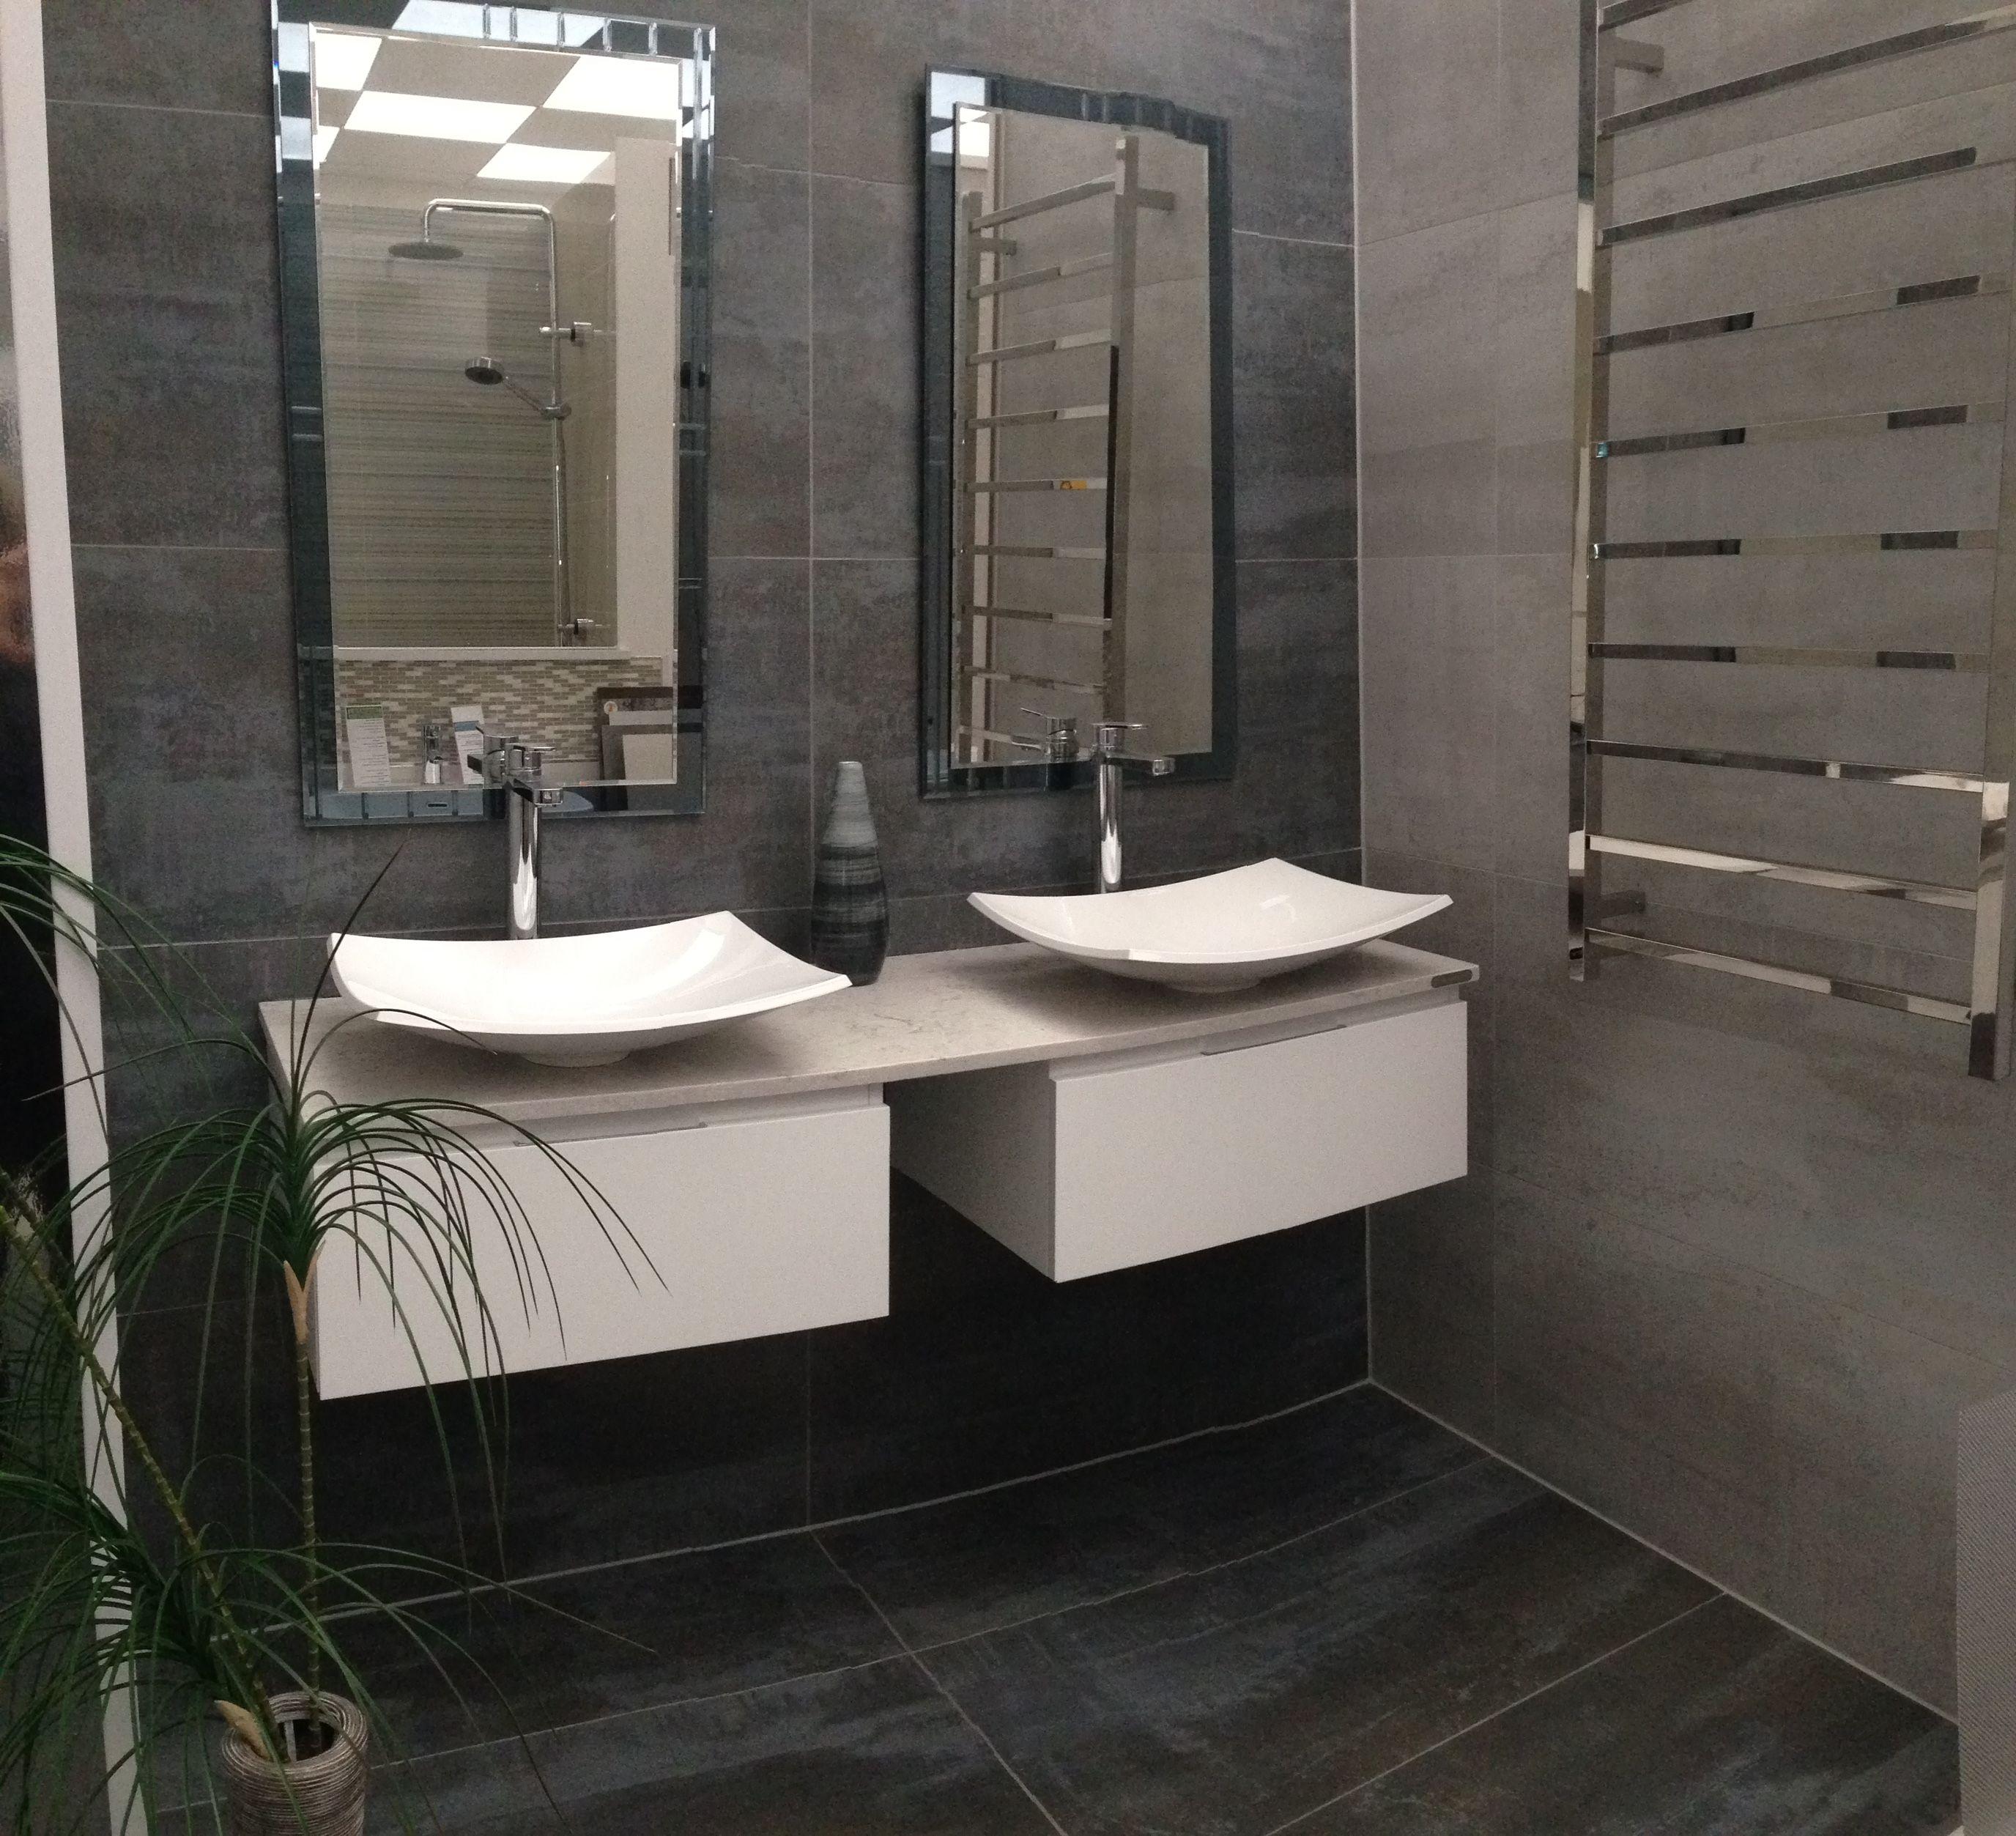 Designer Vanity Units For Bathroom Magnificent Pinnatural Tile On Modern Vanity Units And Basins  Pinterest 2018